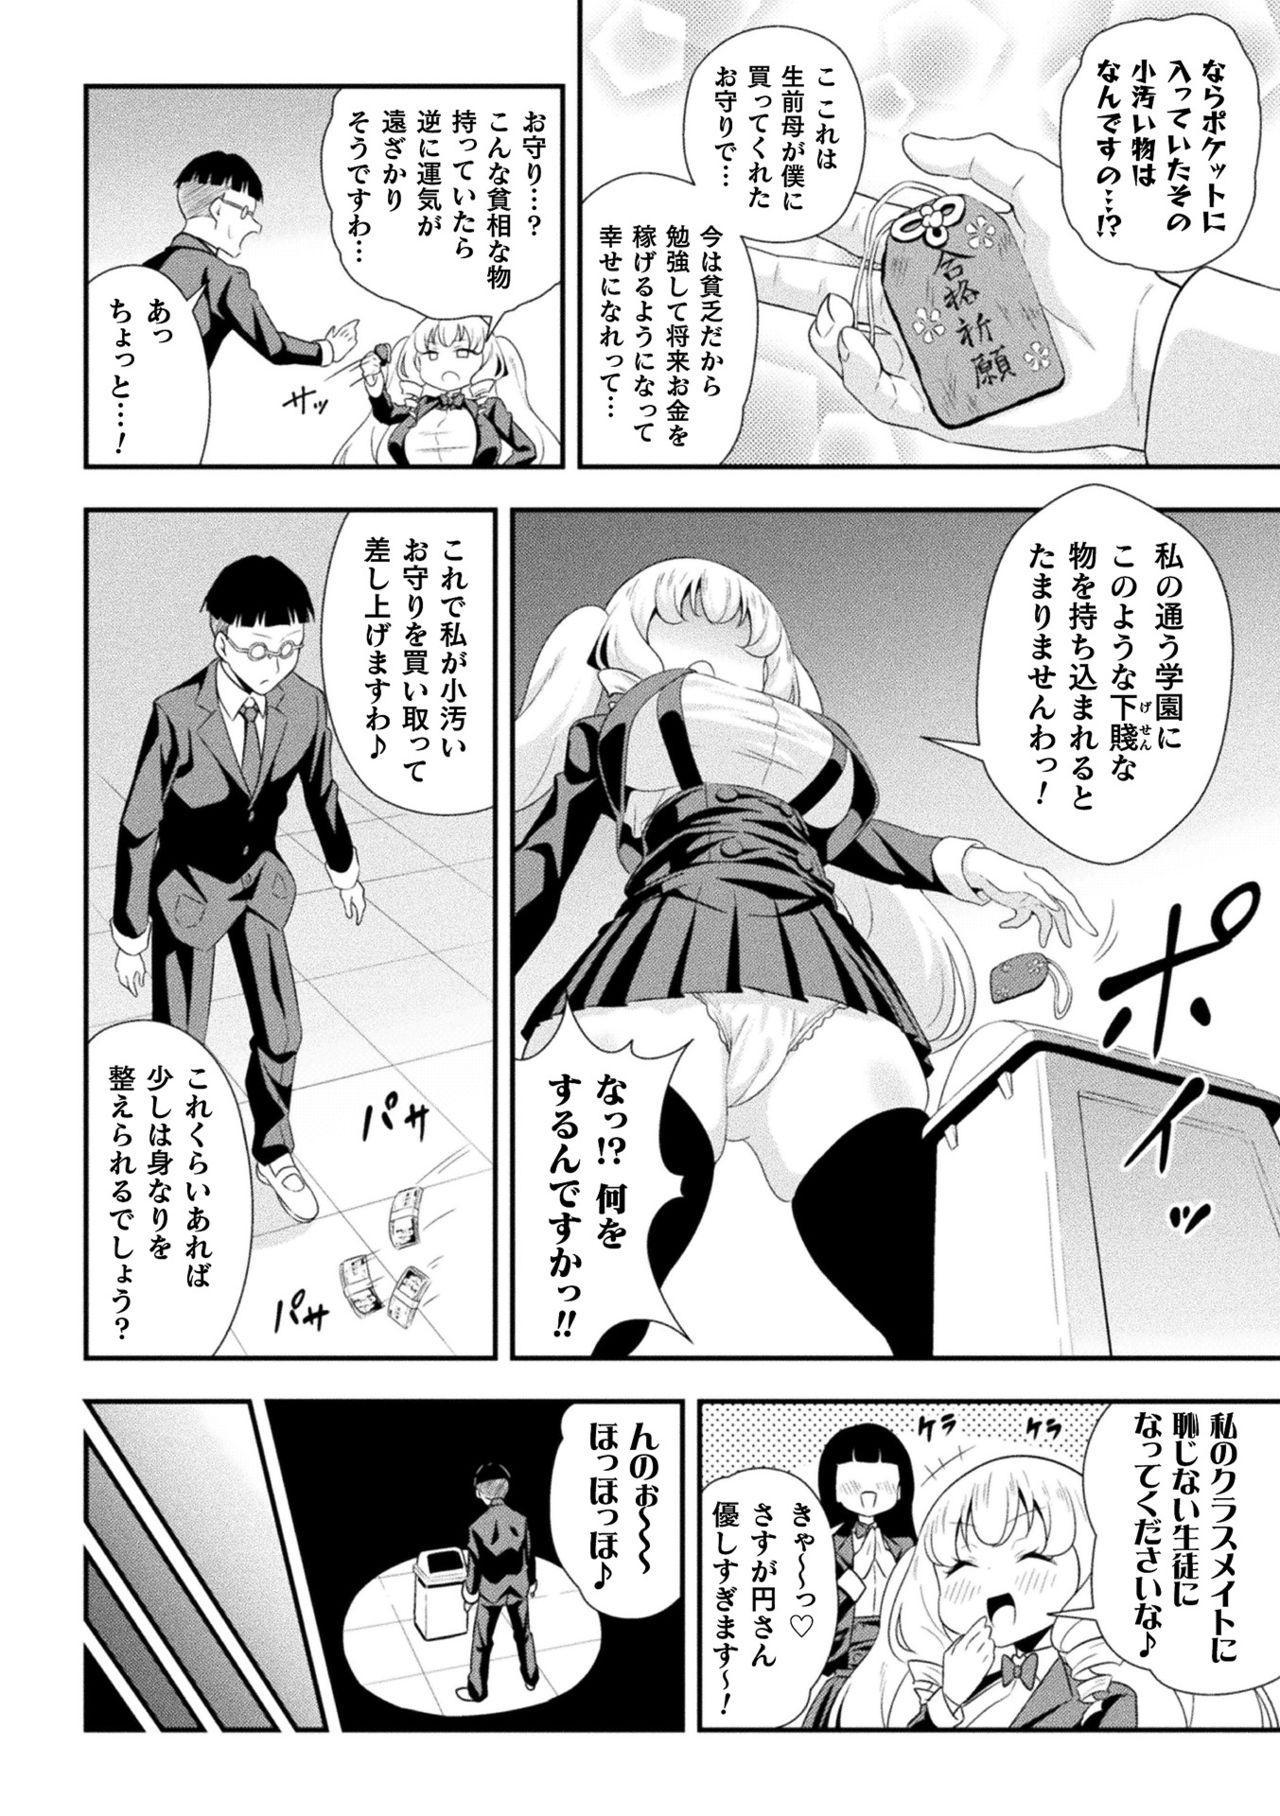 2D Comic Magazine - Syukusyouka Hiroin Kyousei Onahole Keikaku Vol. 2 3